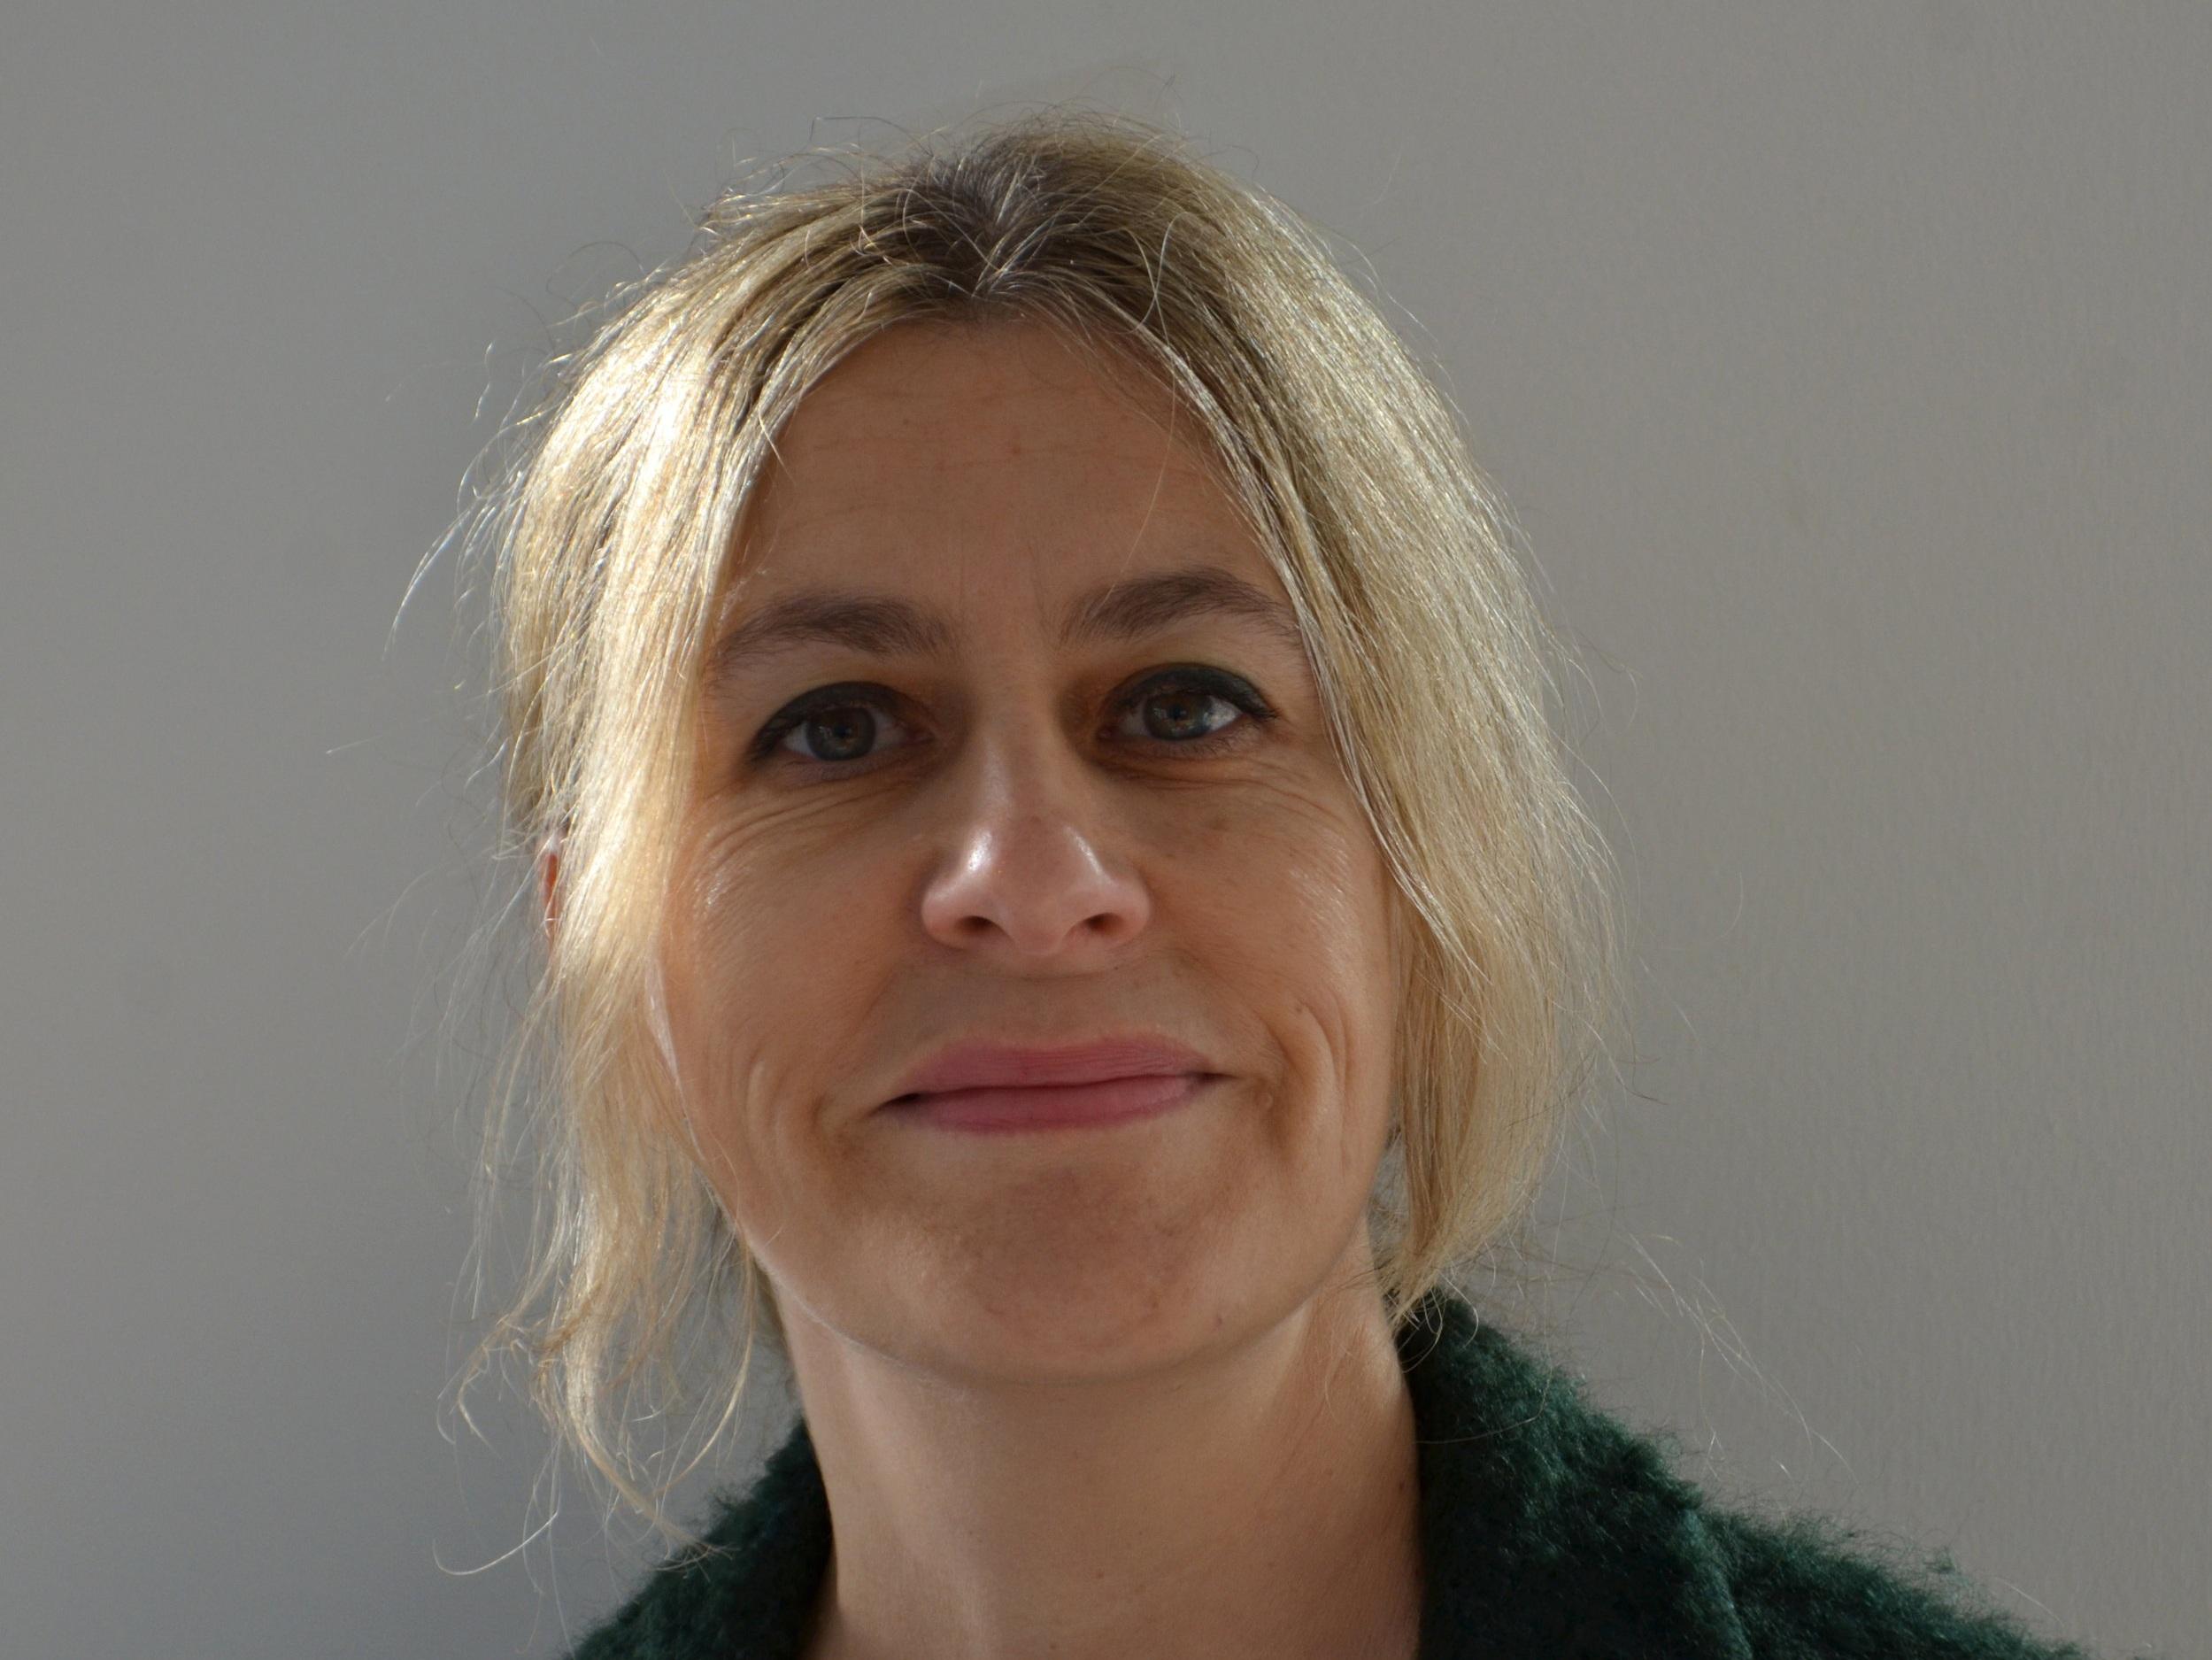 Francesca+Spagnoli-Profile-Image.jpg